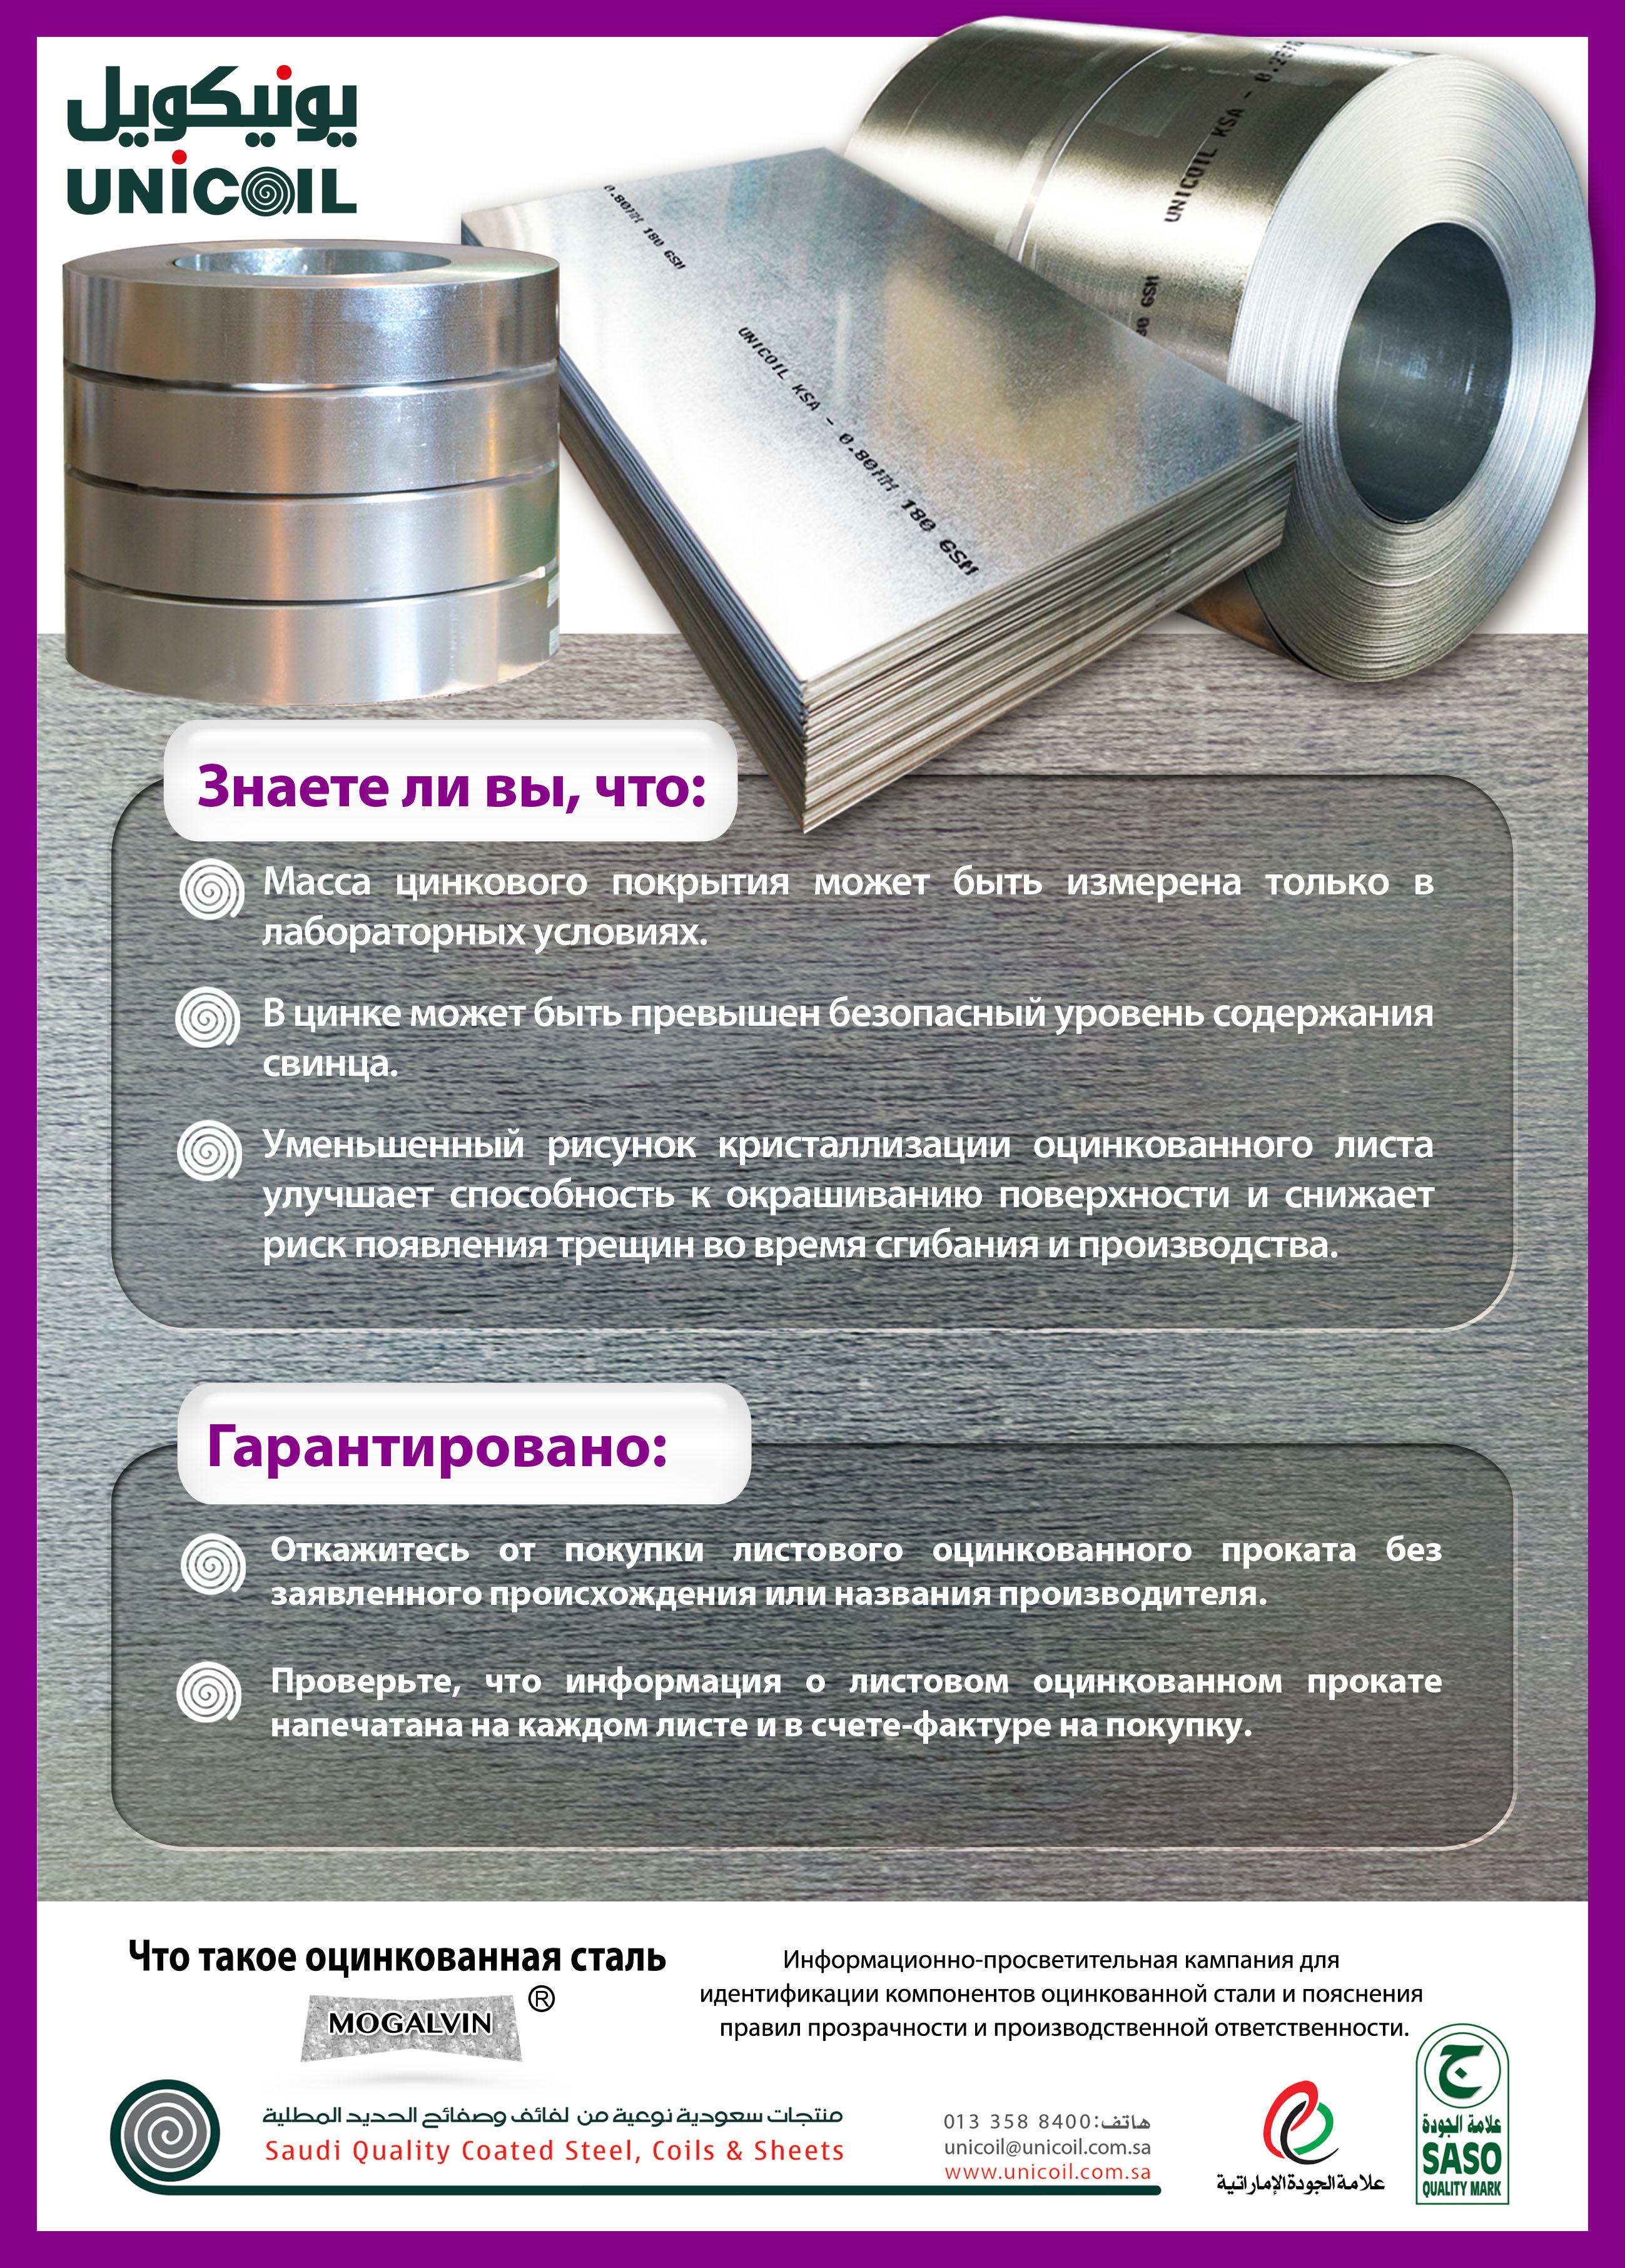 UNICOIL GI Product Components